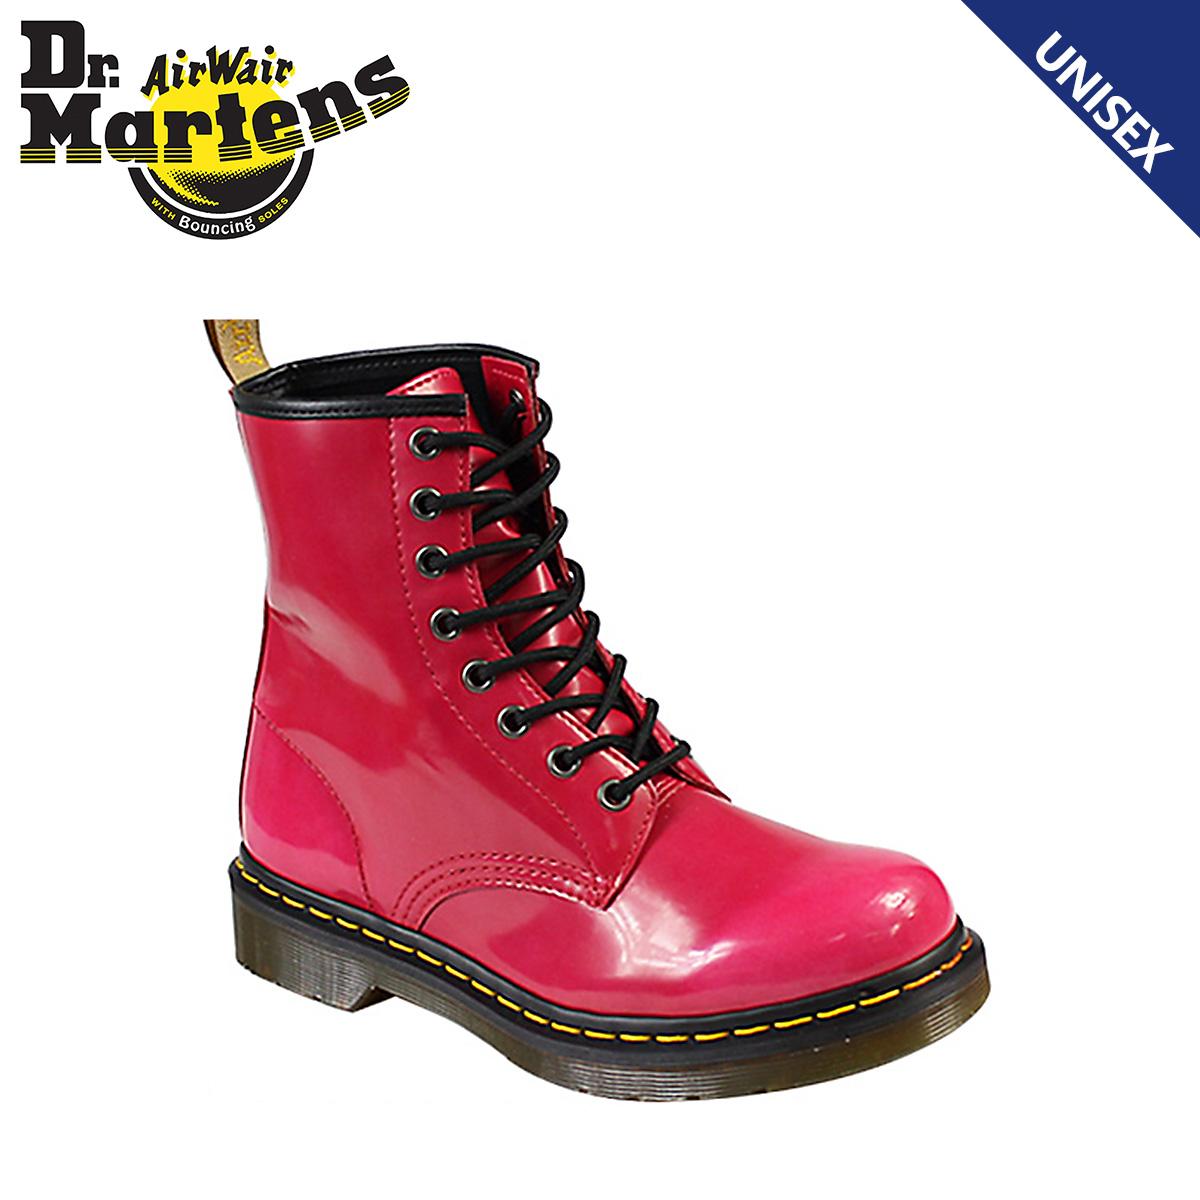 Dr.Martens ドクターマーチン 1460 8ホール ブーツ 8EYE BOOT R14585670 メンズ レディース